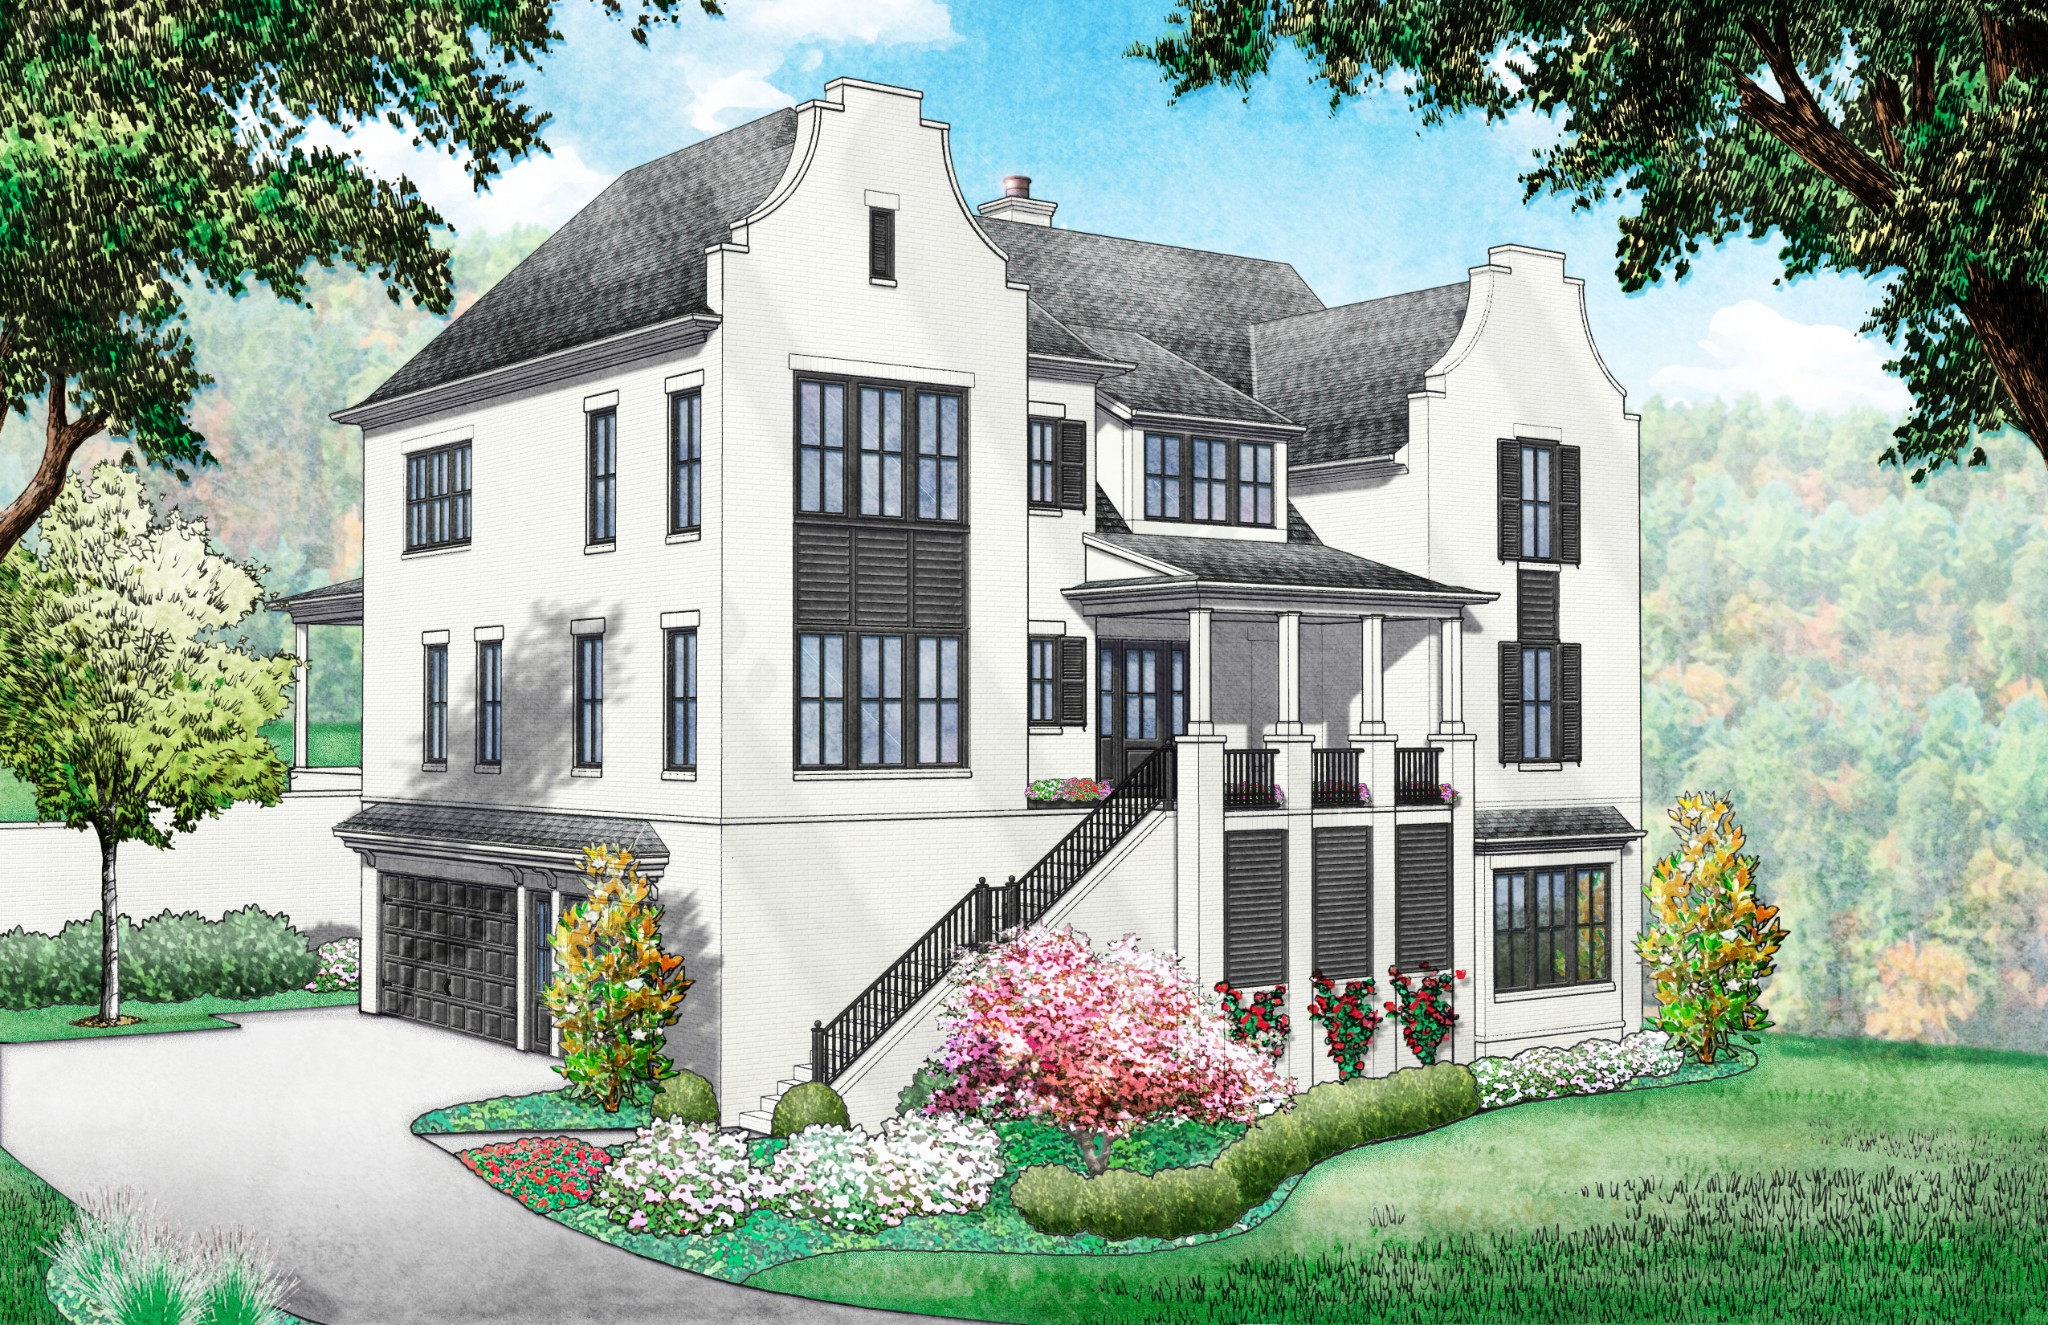 8944 Calendula Ln (Lot 6043), College Grove, TN 37046 - College Grove, TN real estate listing